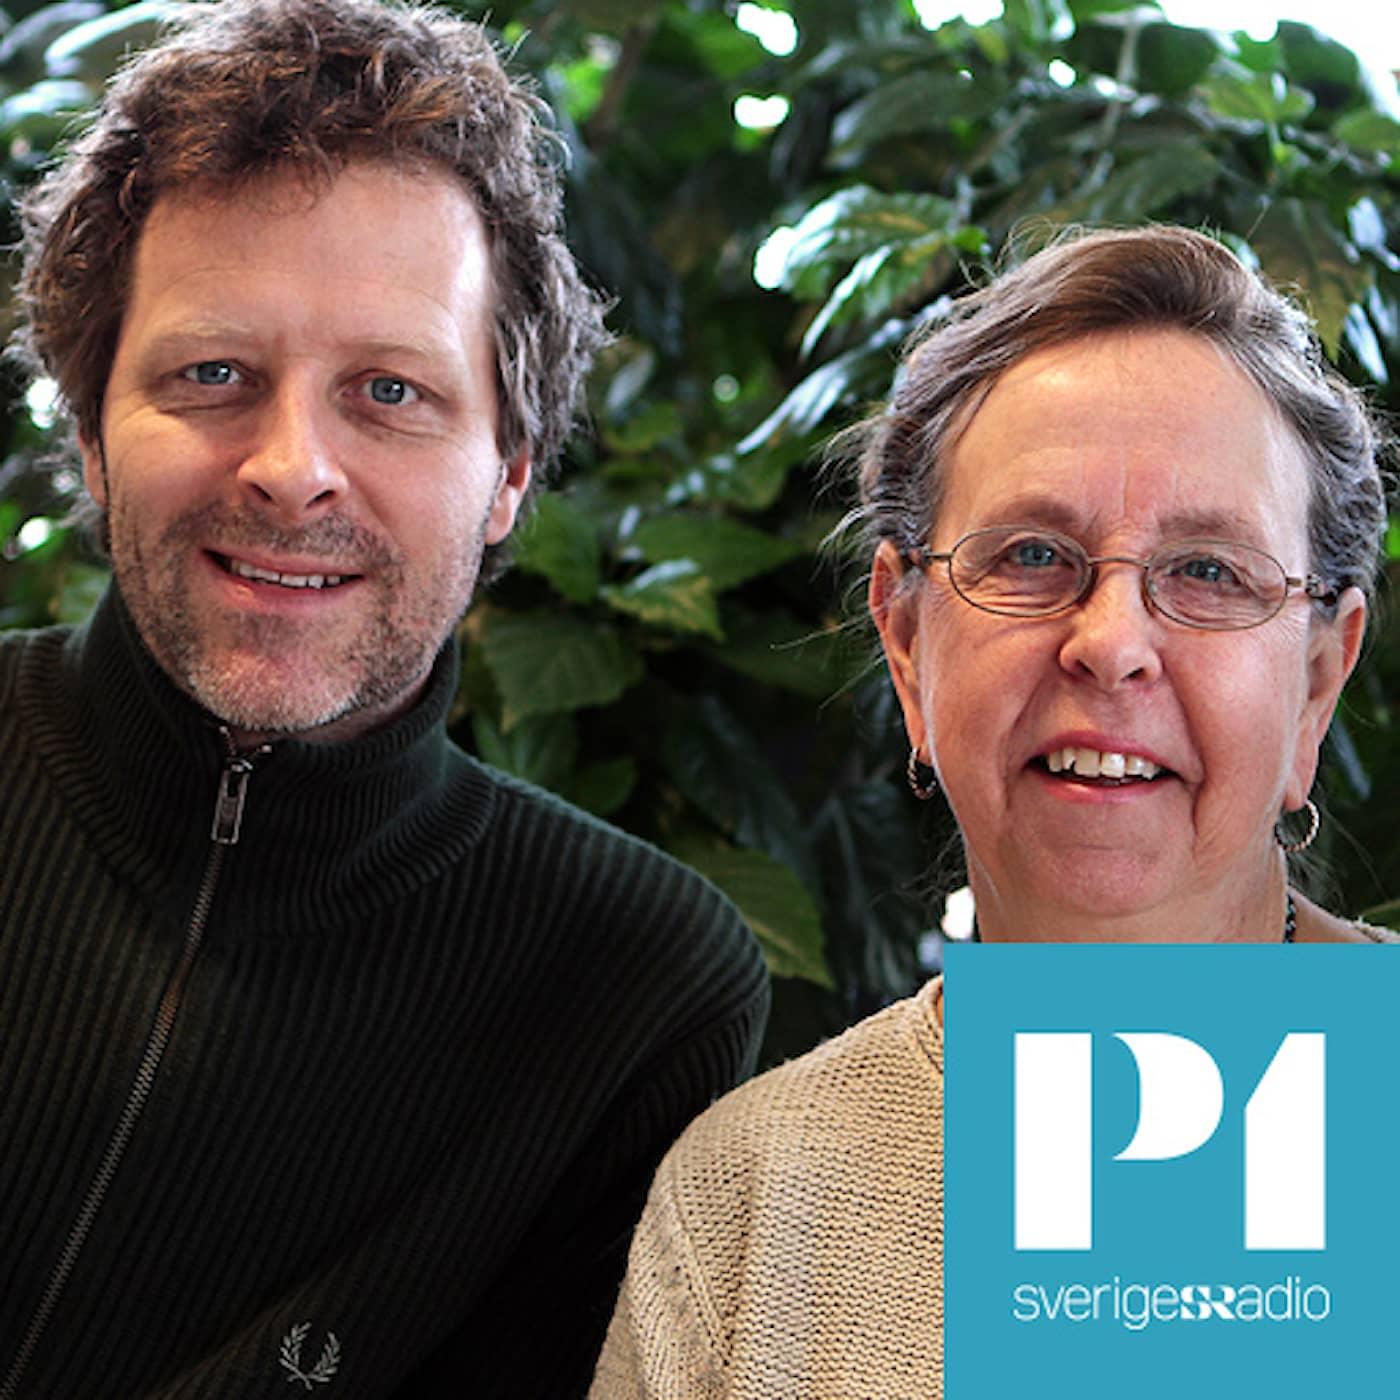 Odla med p1 (podcast)